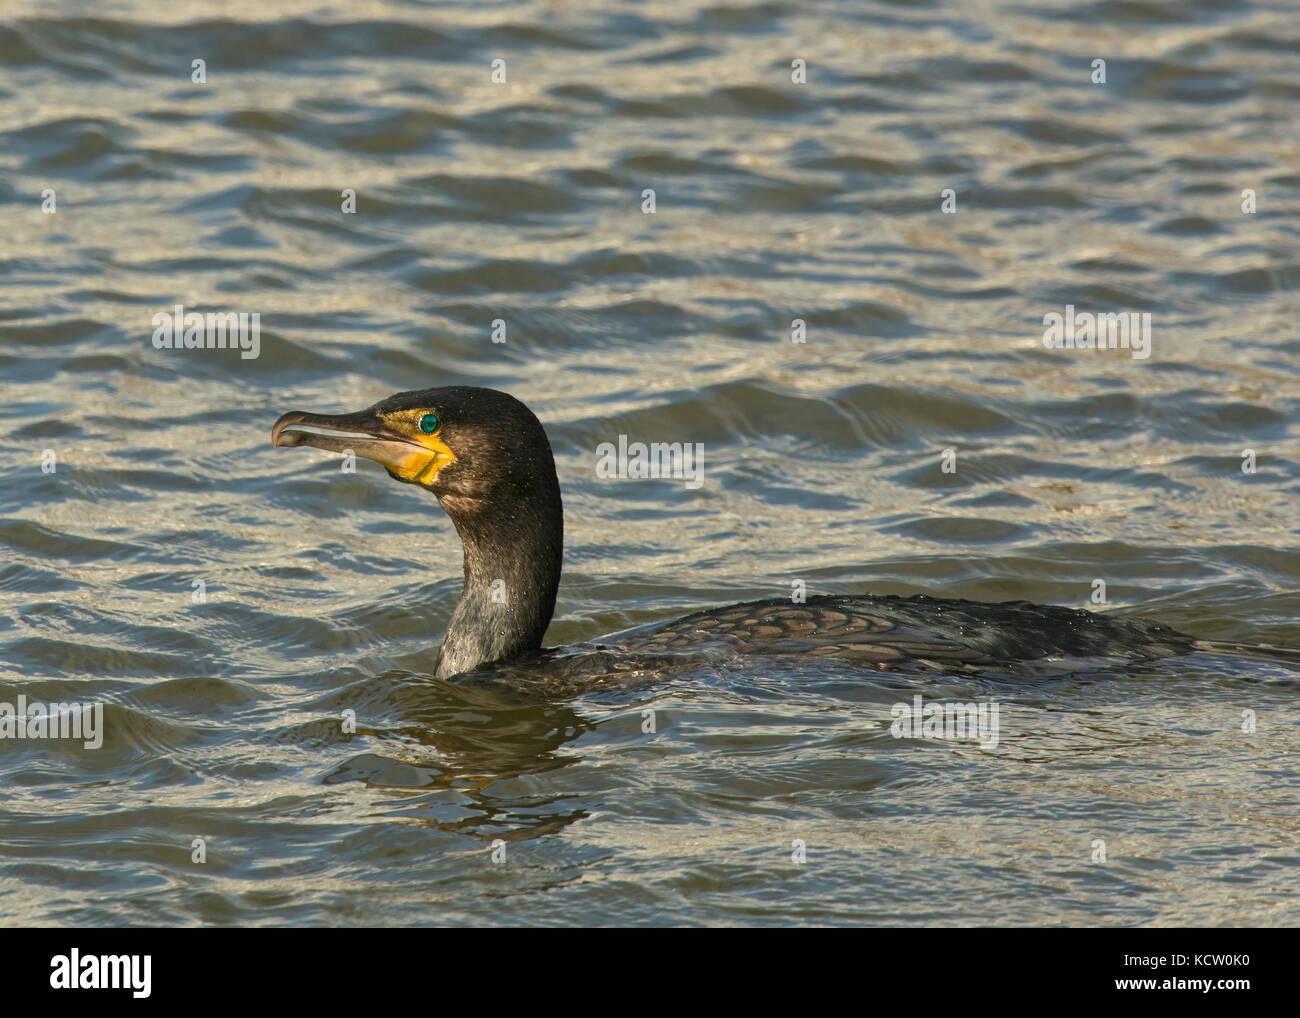 Cormorant bird swimming